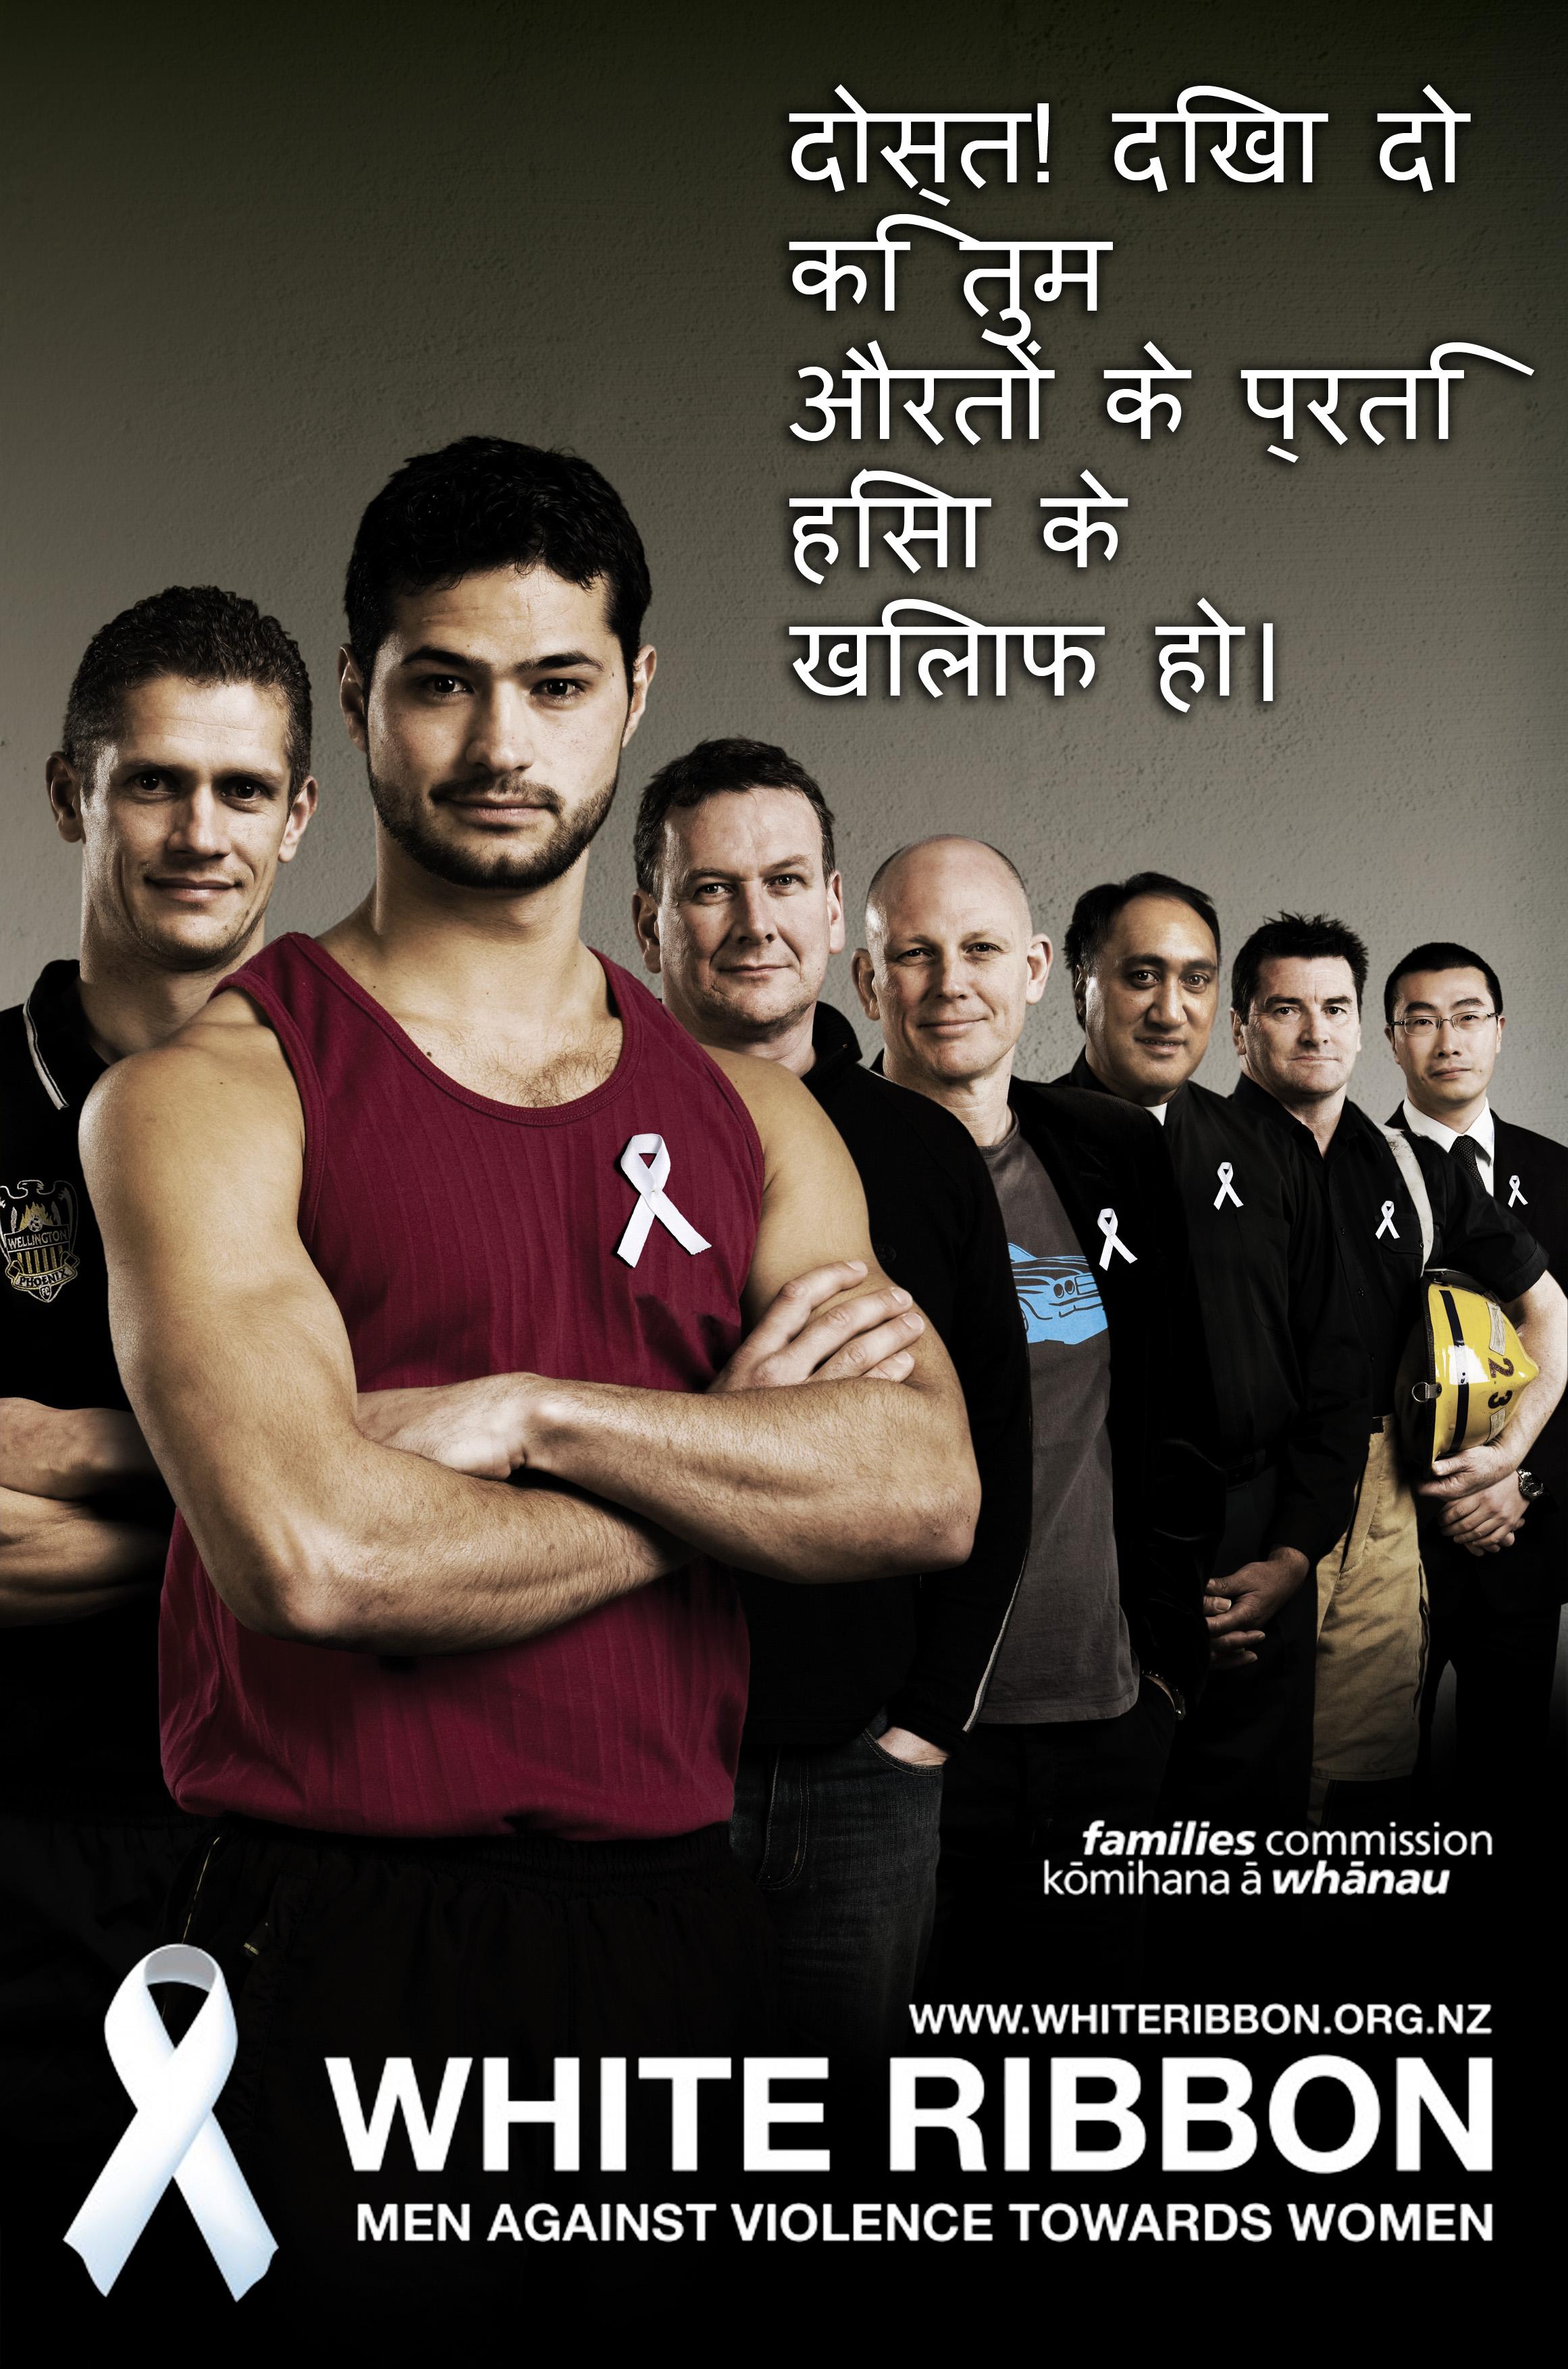 mate poster Hindi - Indian